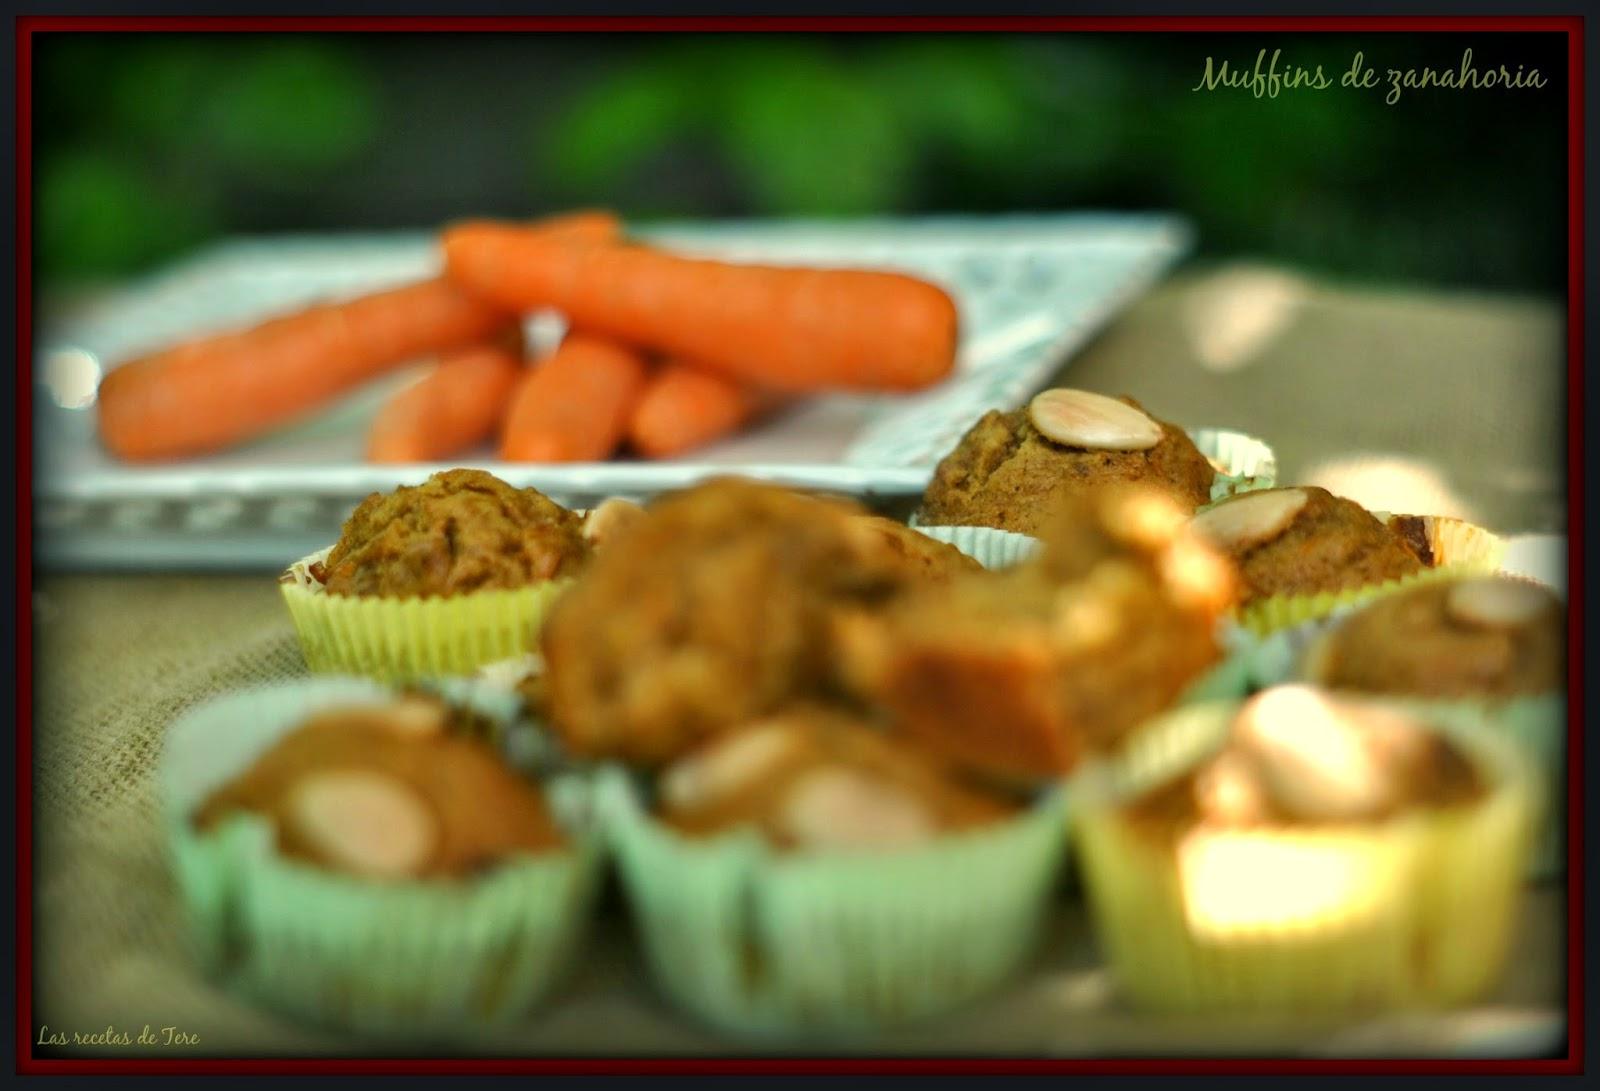 Muffins de zanahoria 06